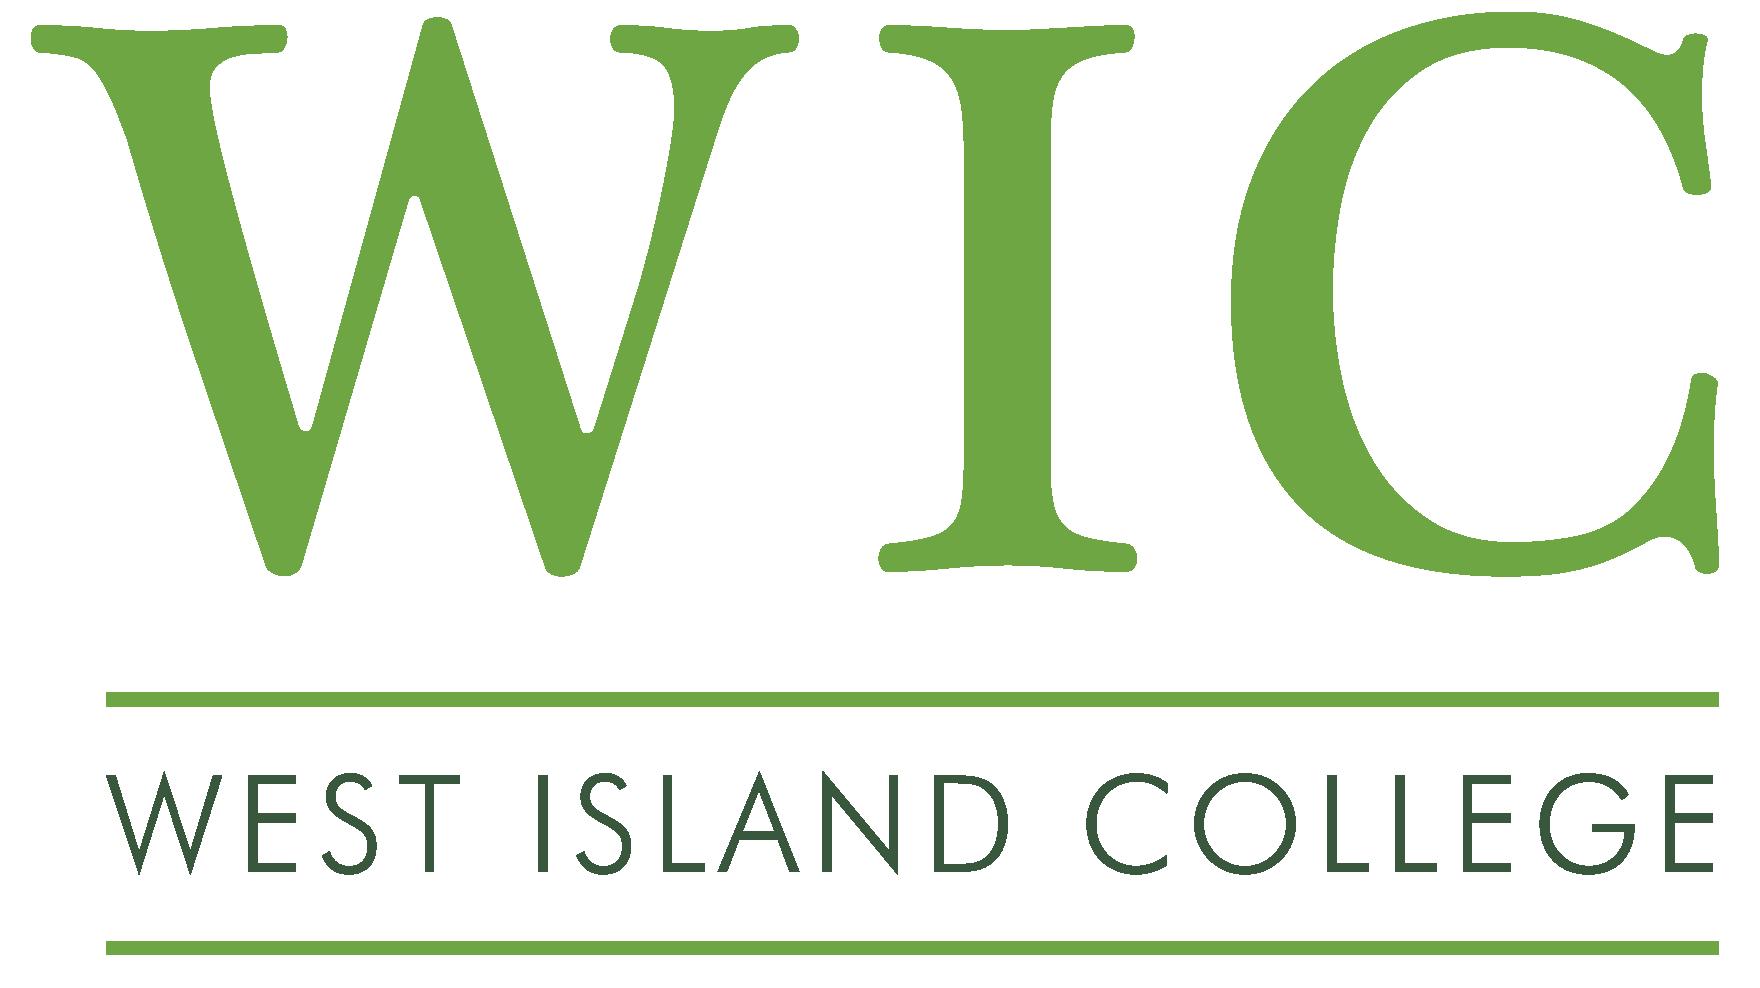 West Island College